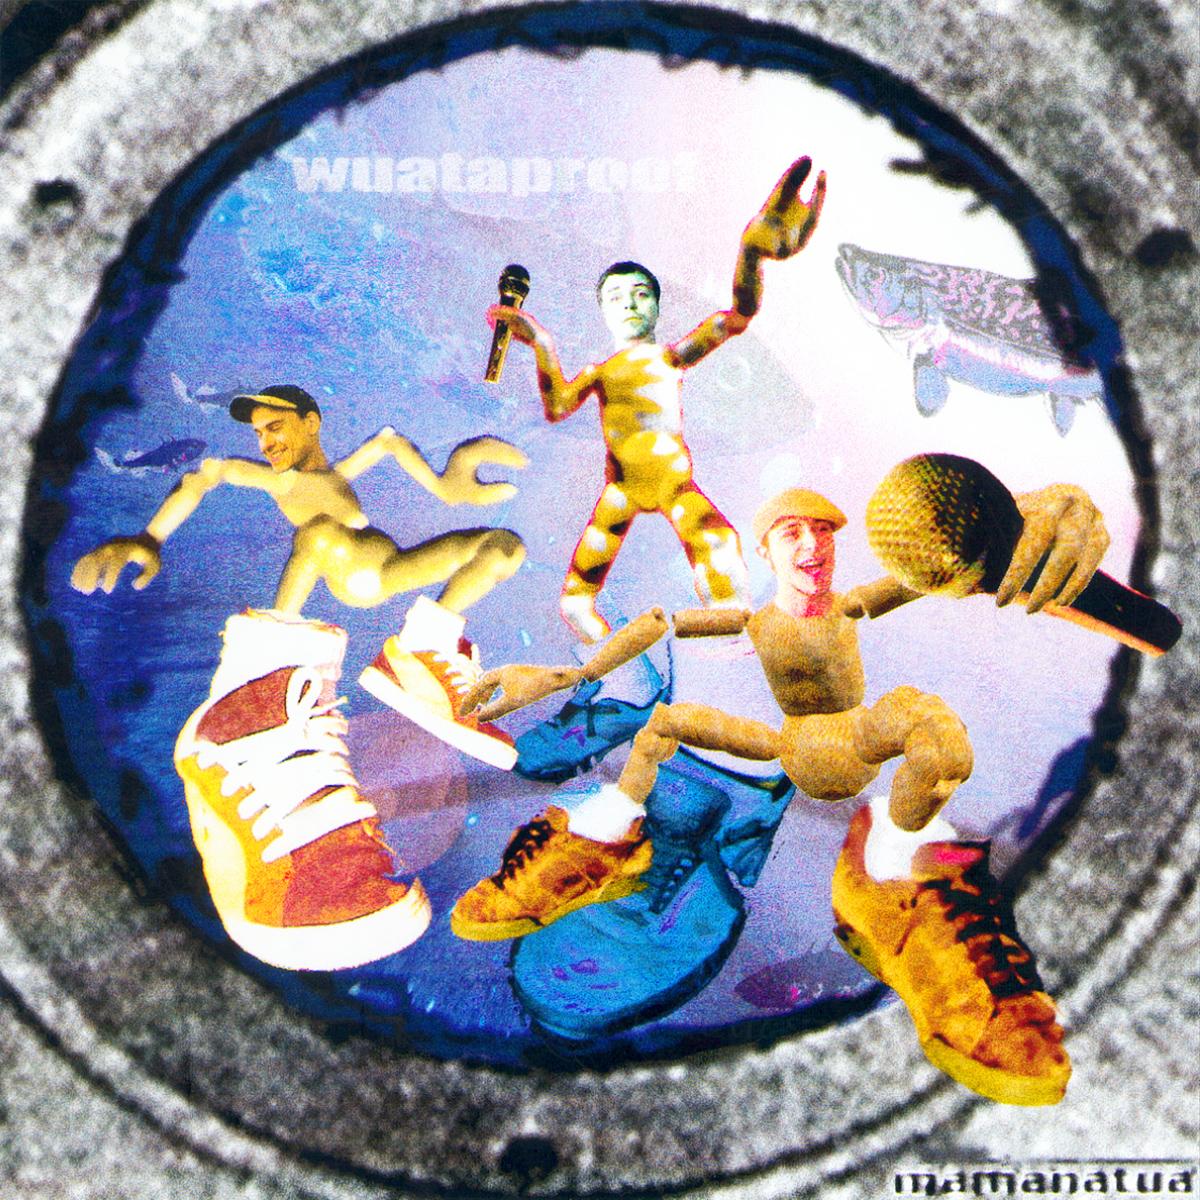 mamanatua – wuataproof (Vinyl)